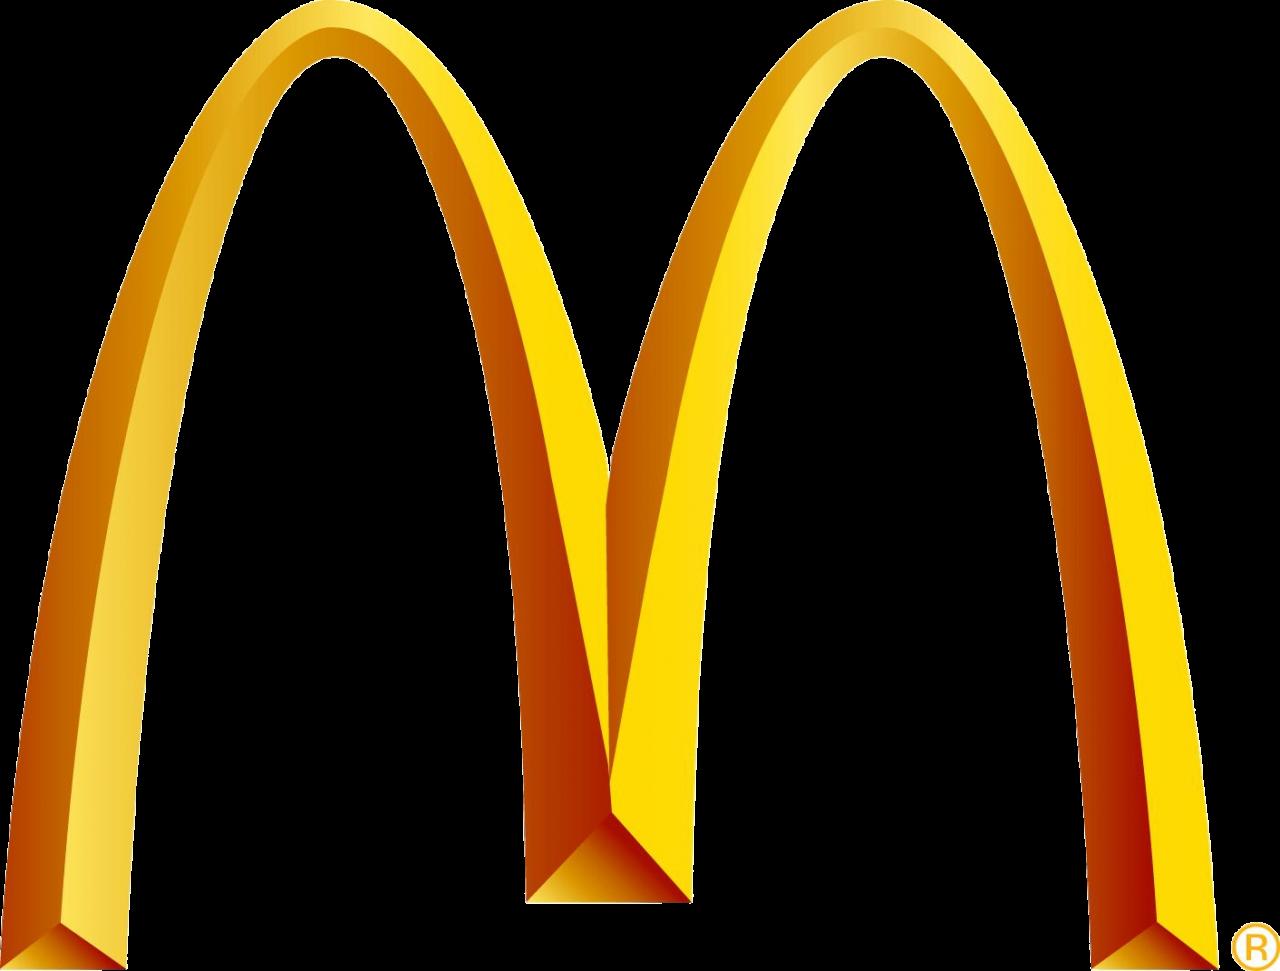 Macdonald's Icon PNG Image